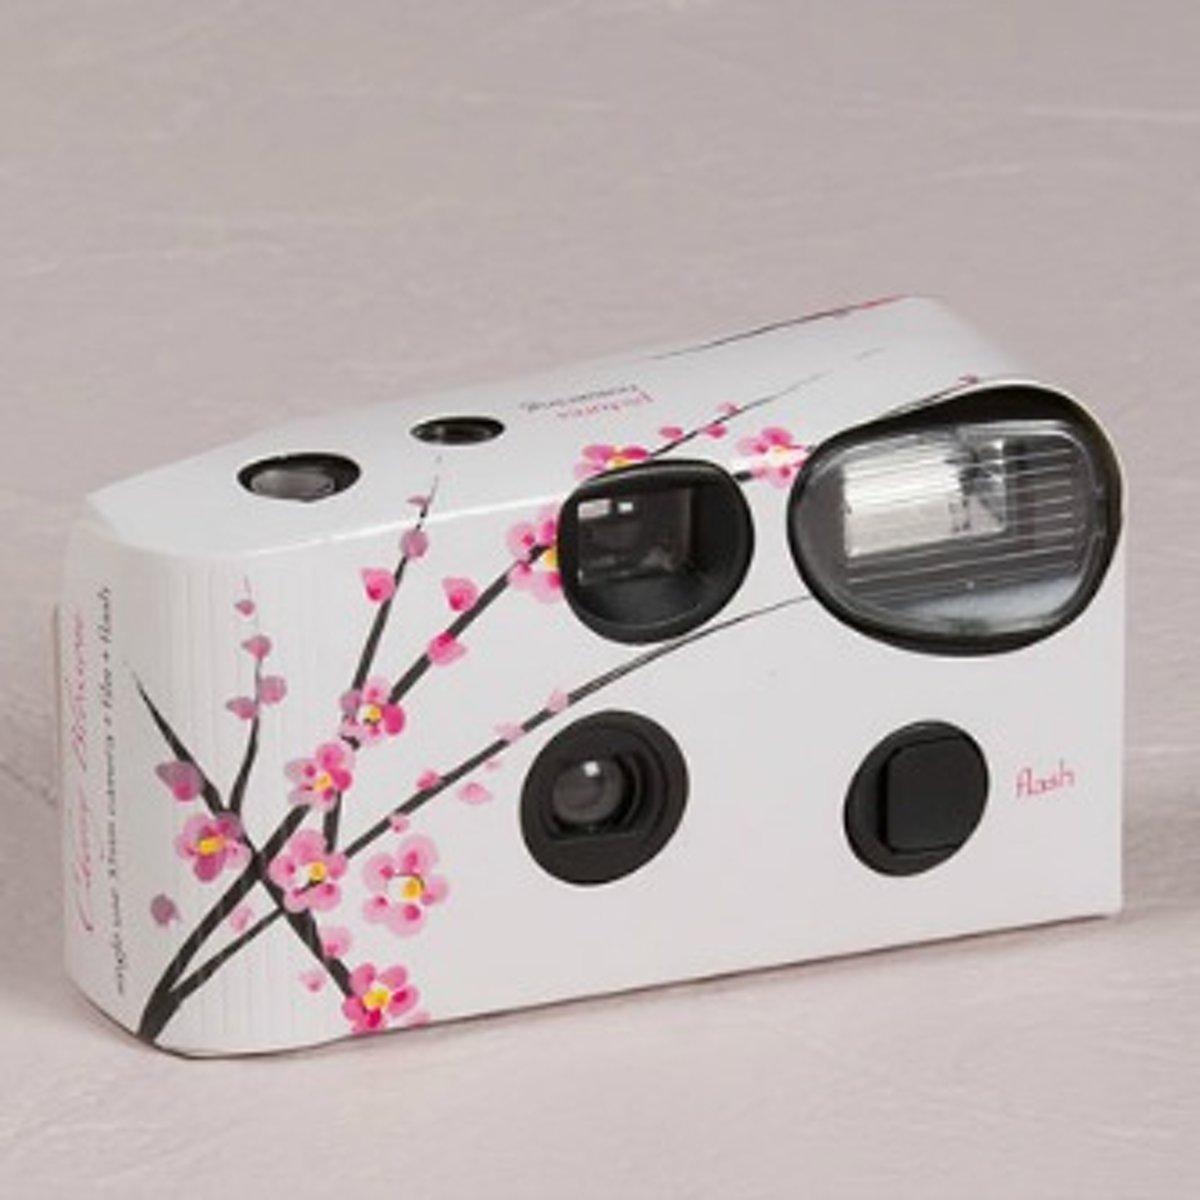 Weddingstar Wegwerpcamera cherry blossom kopen